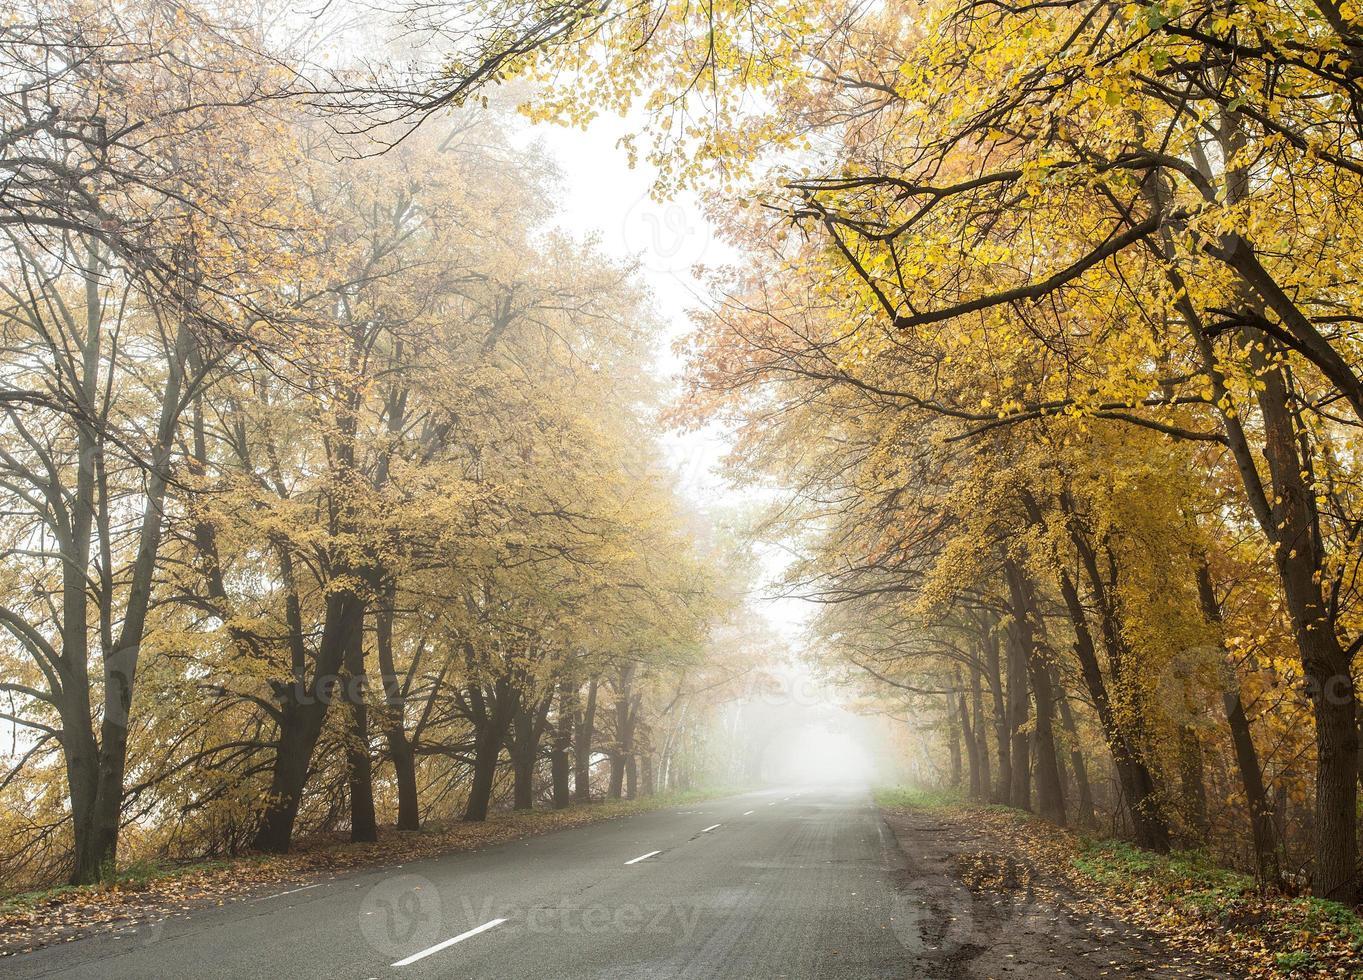 niebla de otoño camino. foto